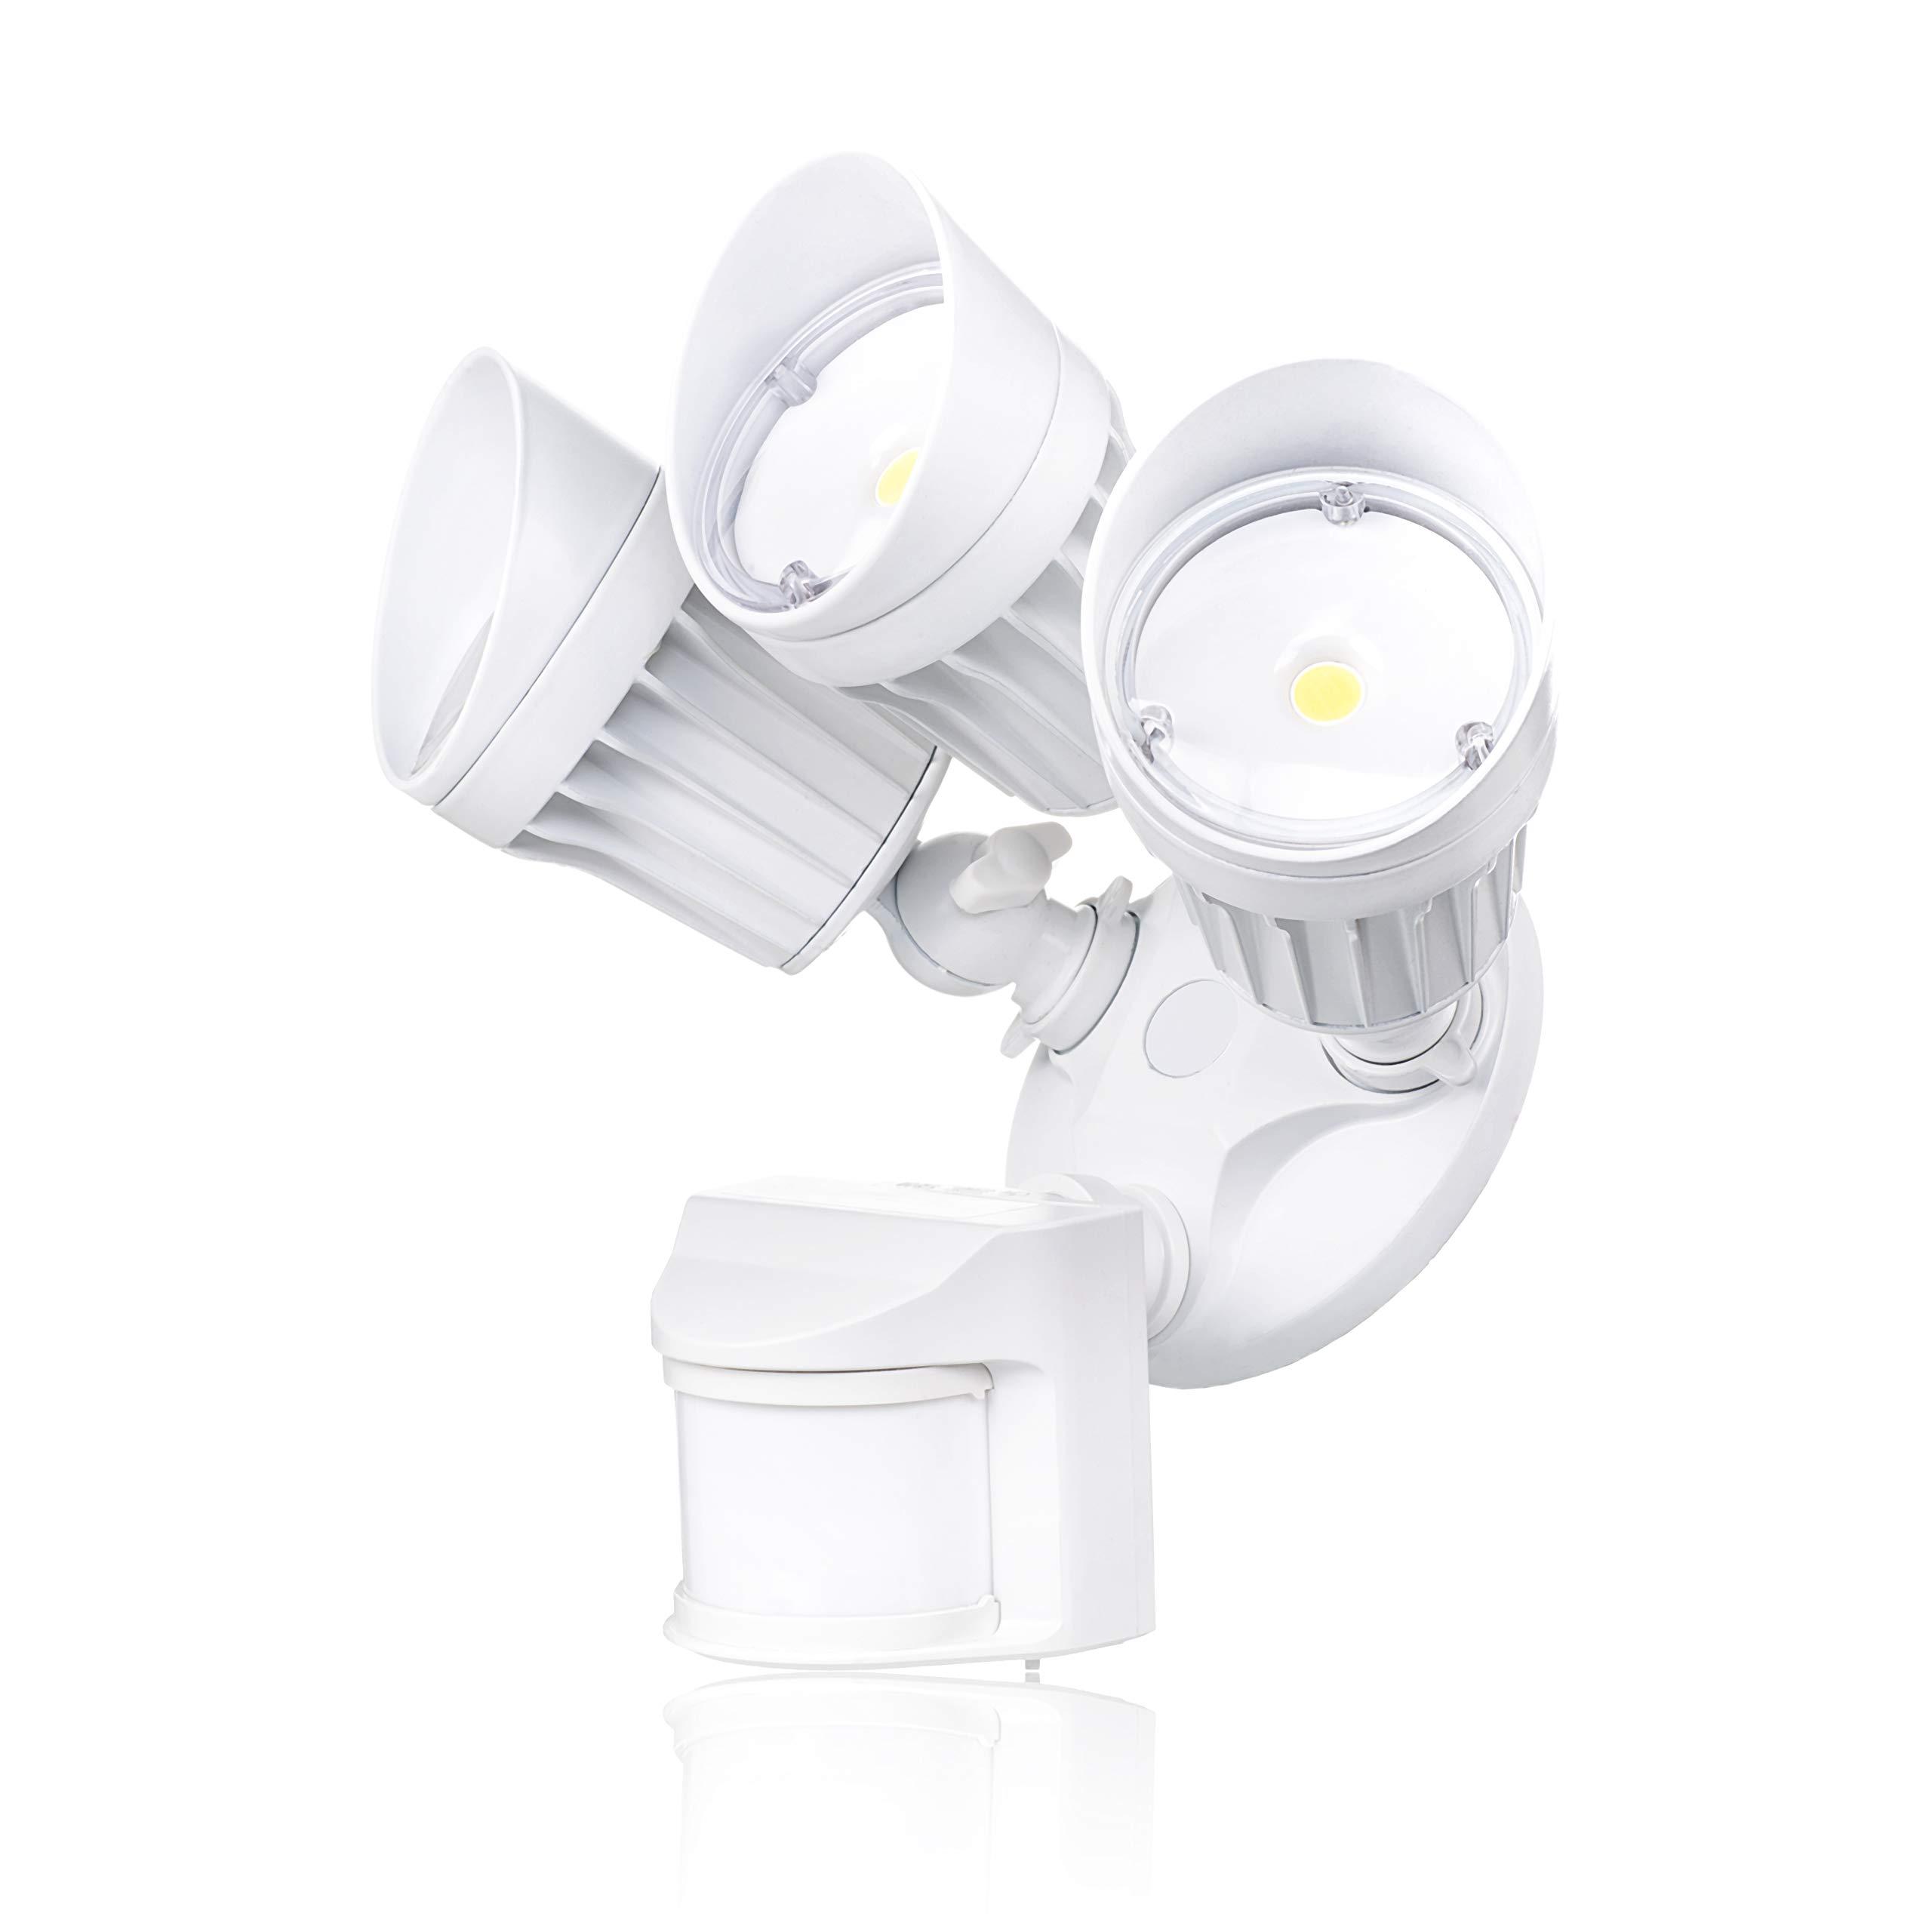 Parmida LED Security Light, White, 30W (250W Replacement), Outdoor Motion Sensor Light & Dusk to Dawn Photocell, 3 Adjustable Heads, 2250LM, 5000K (Day Light), Waterproof, ETL & DLC, 120V